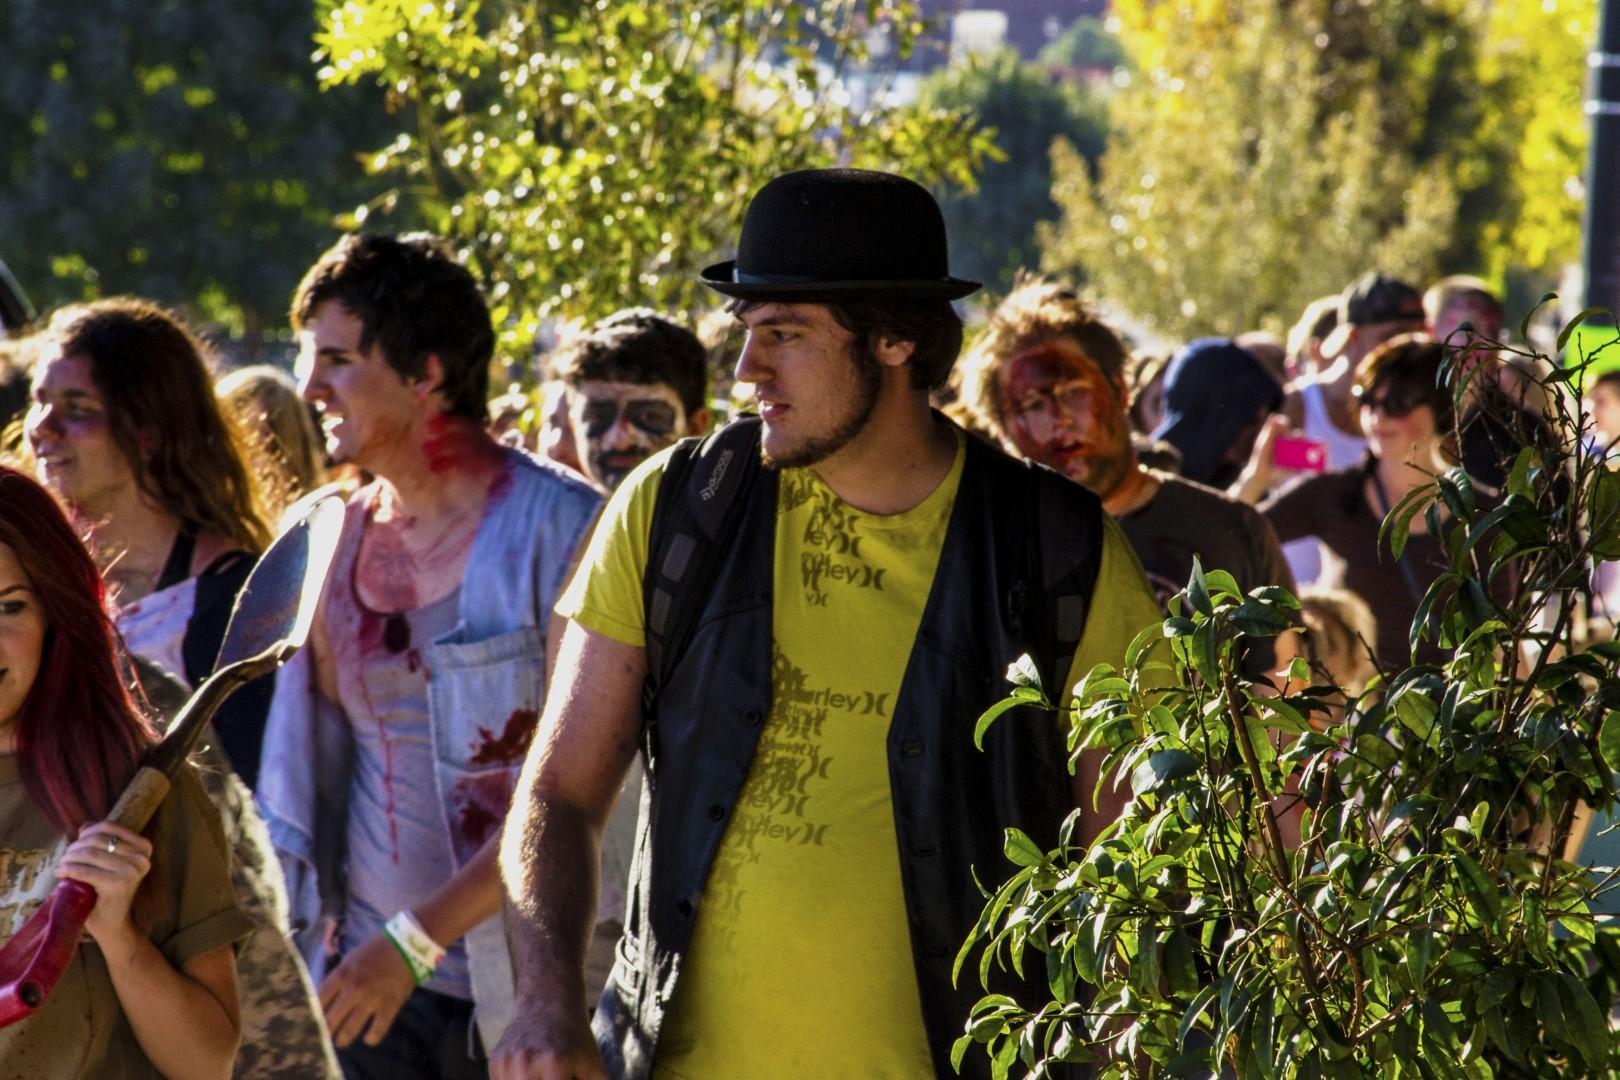 St. George Zombie Walk, St. George, Utah, Oct. 26, 2013 | Photo by Jeremy Crawford, St. George News